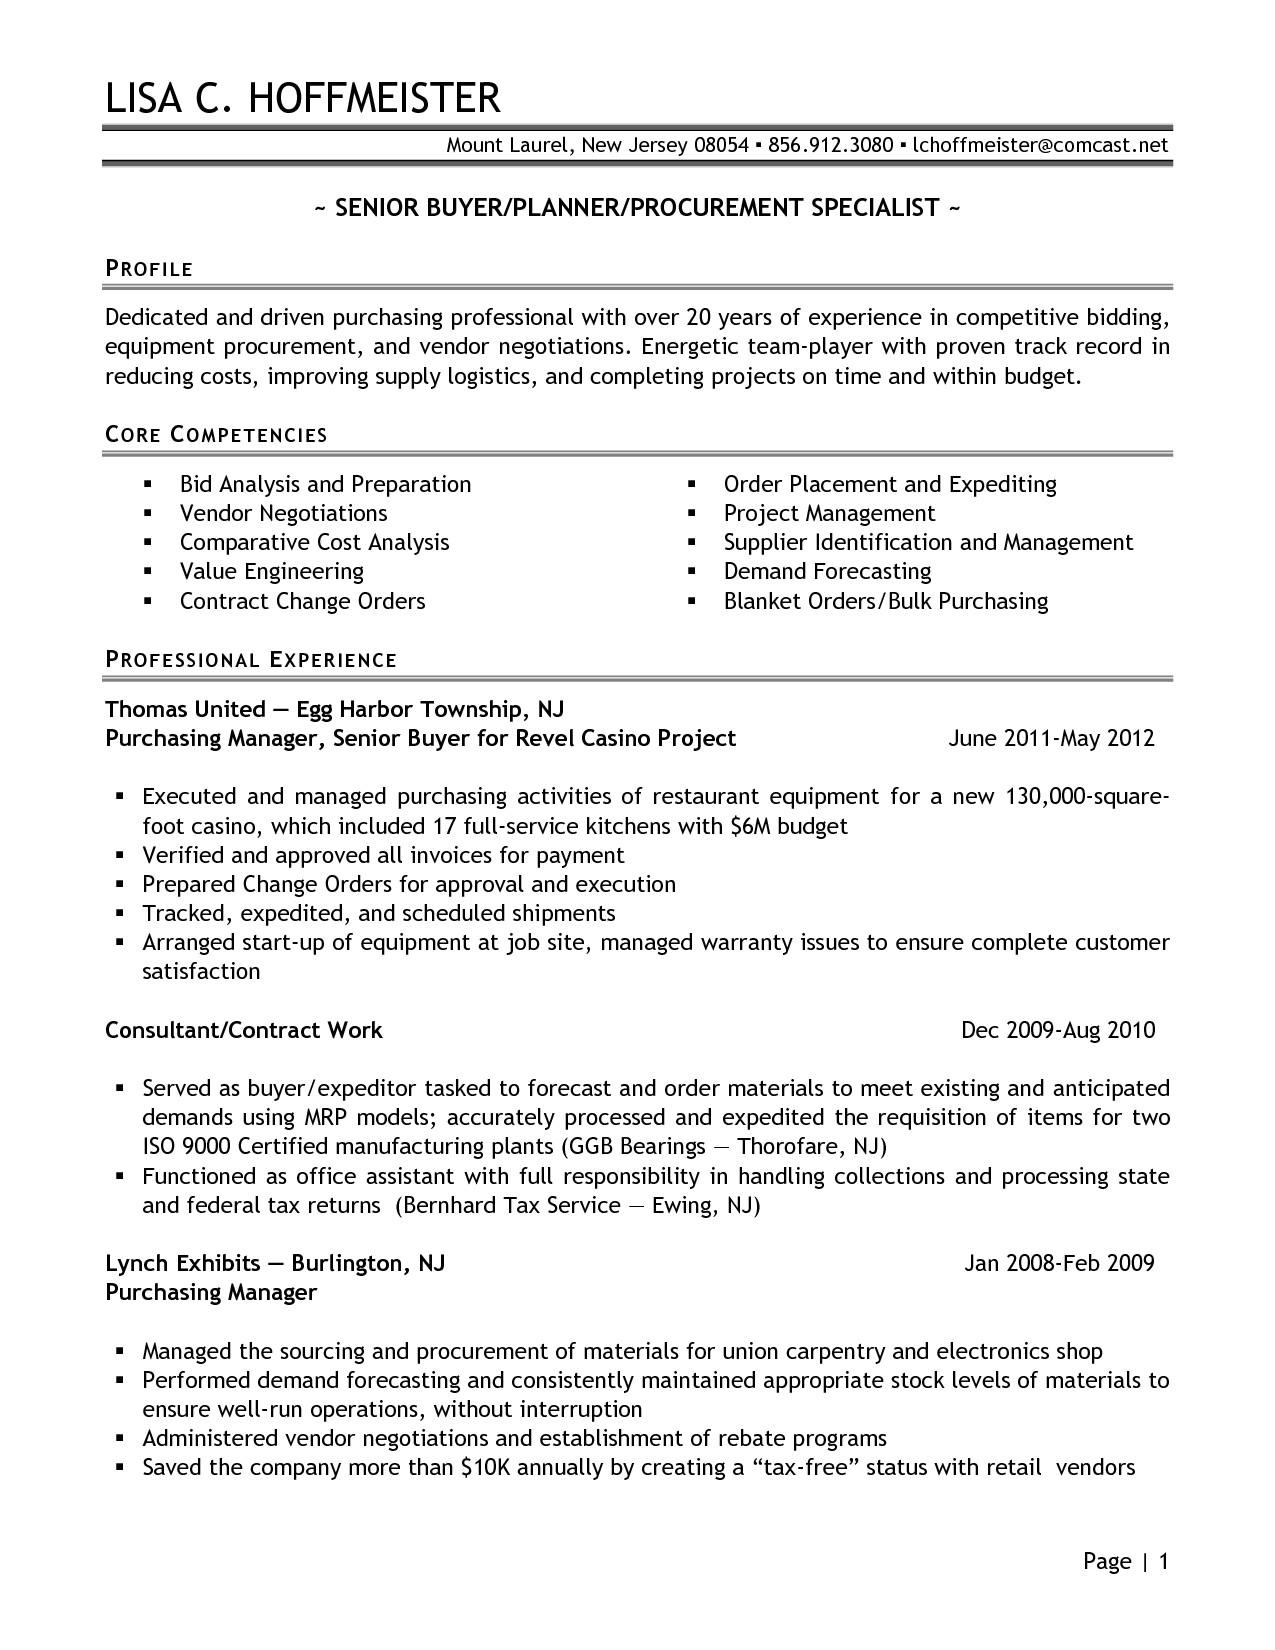 senior logistic management resume senior buyer purchasing